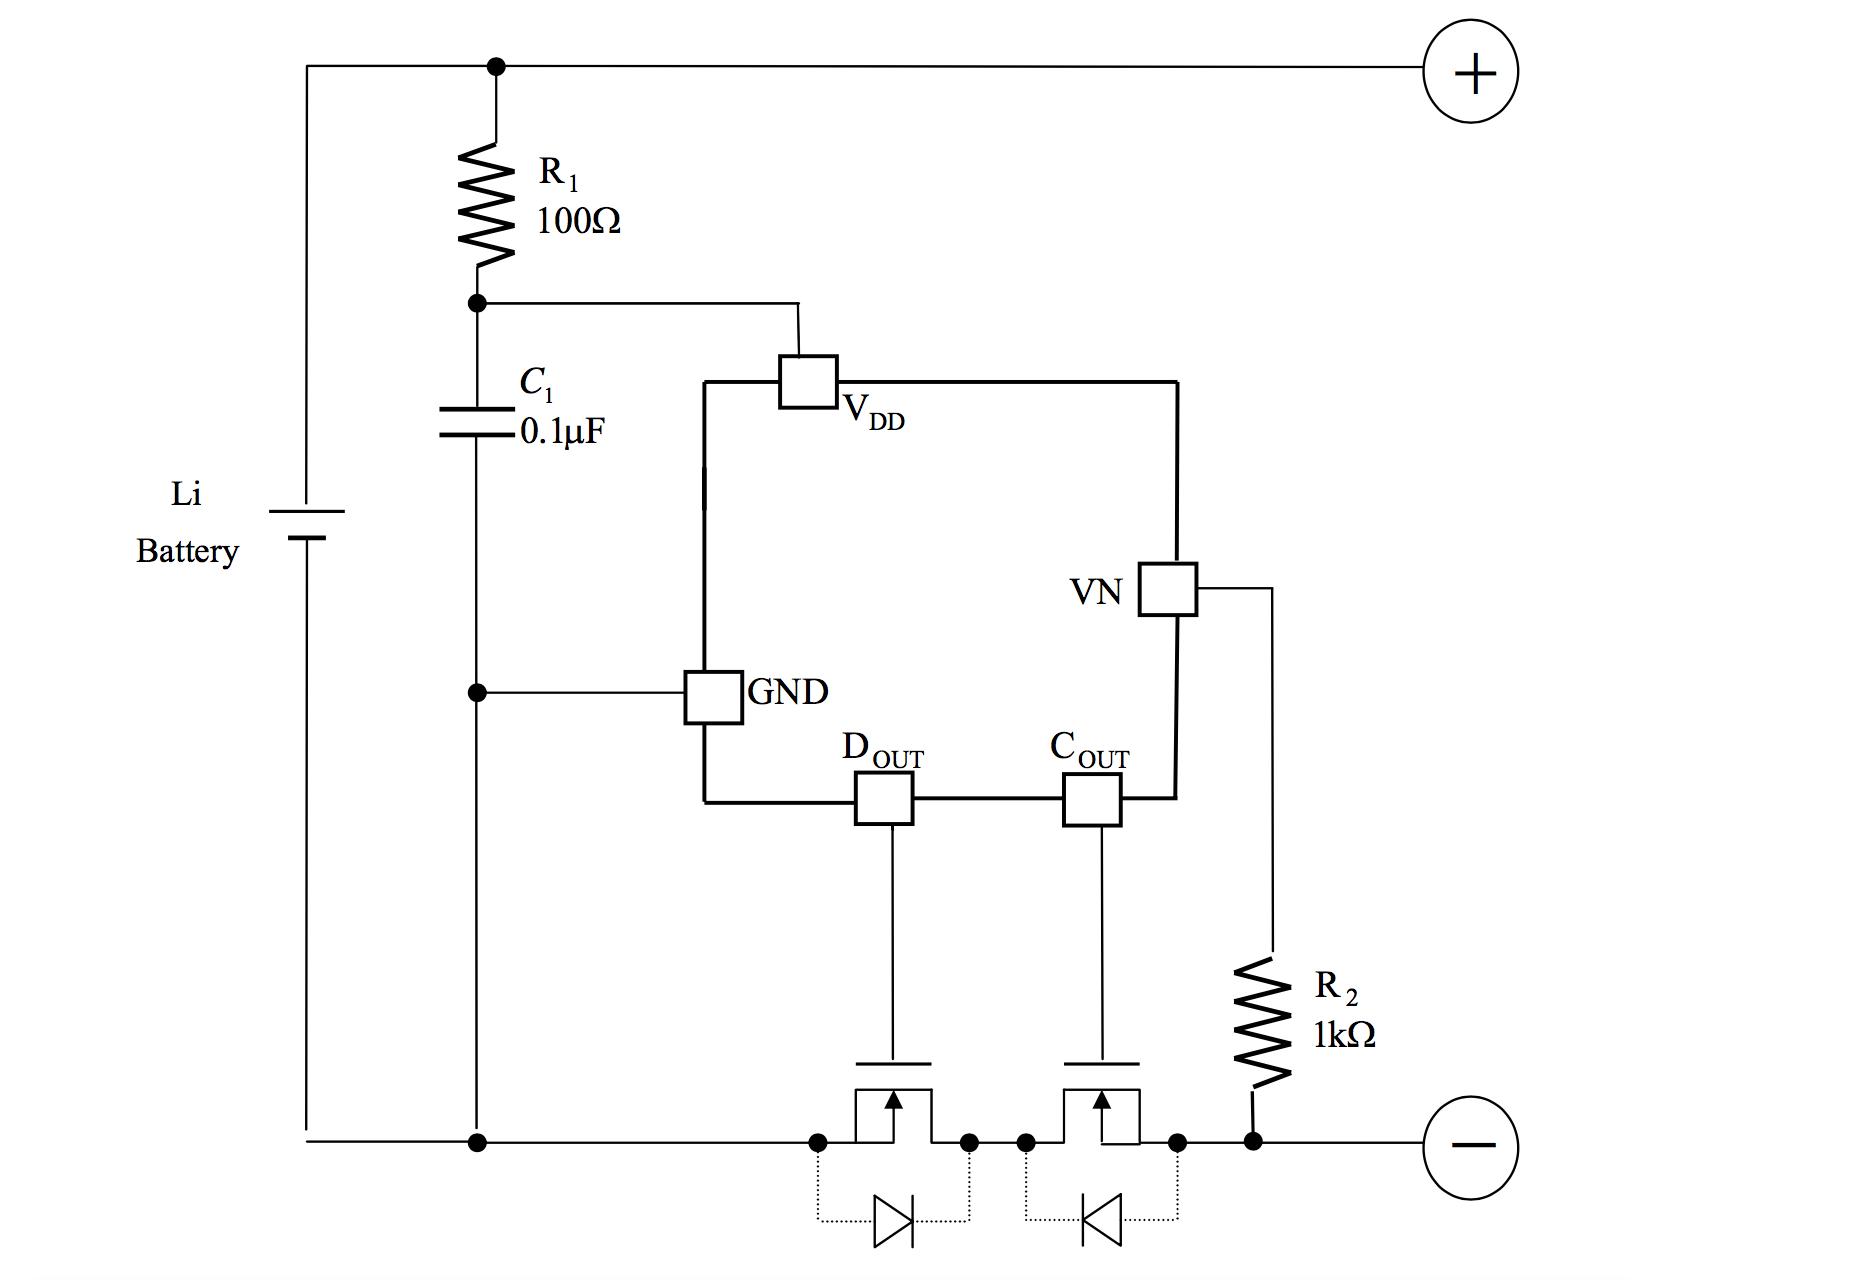 Схема на ААТ8660 для защиты литиевого аккумулятора